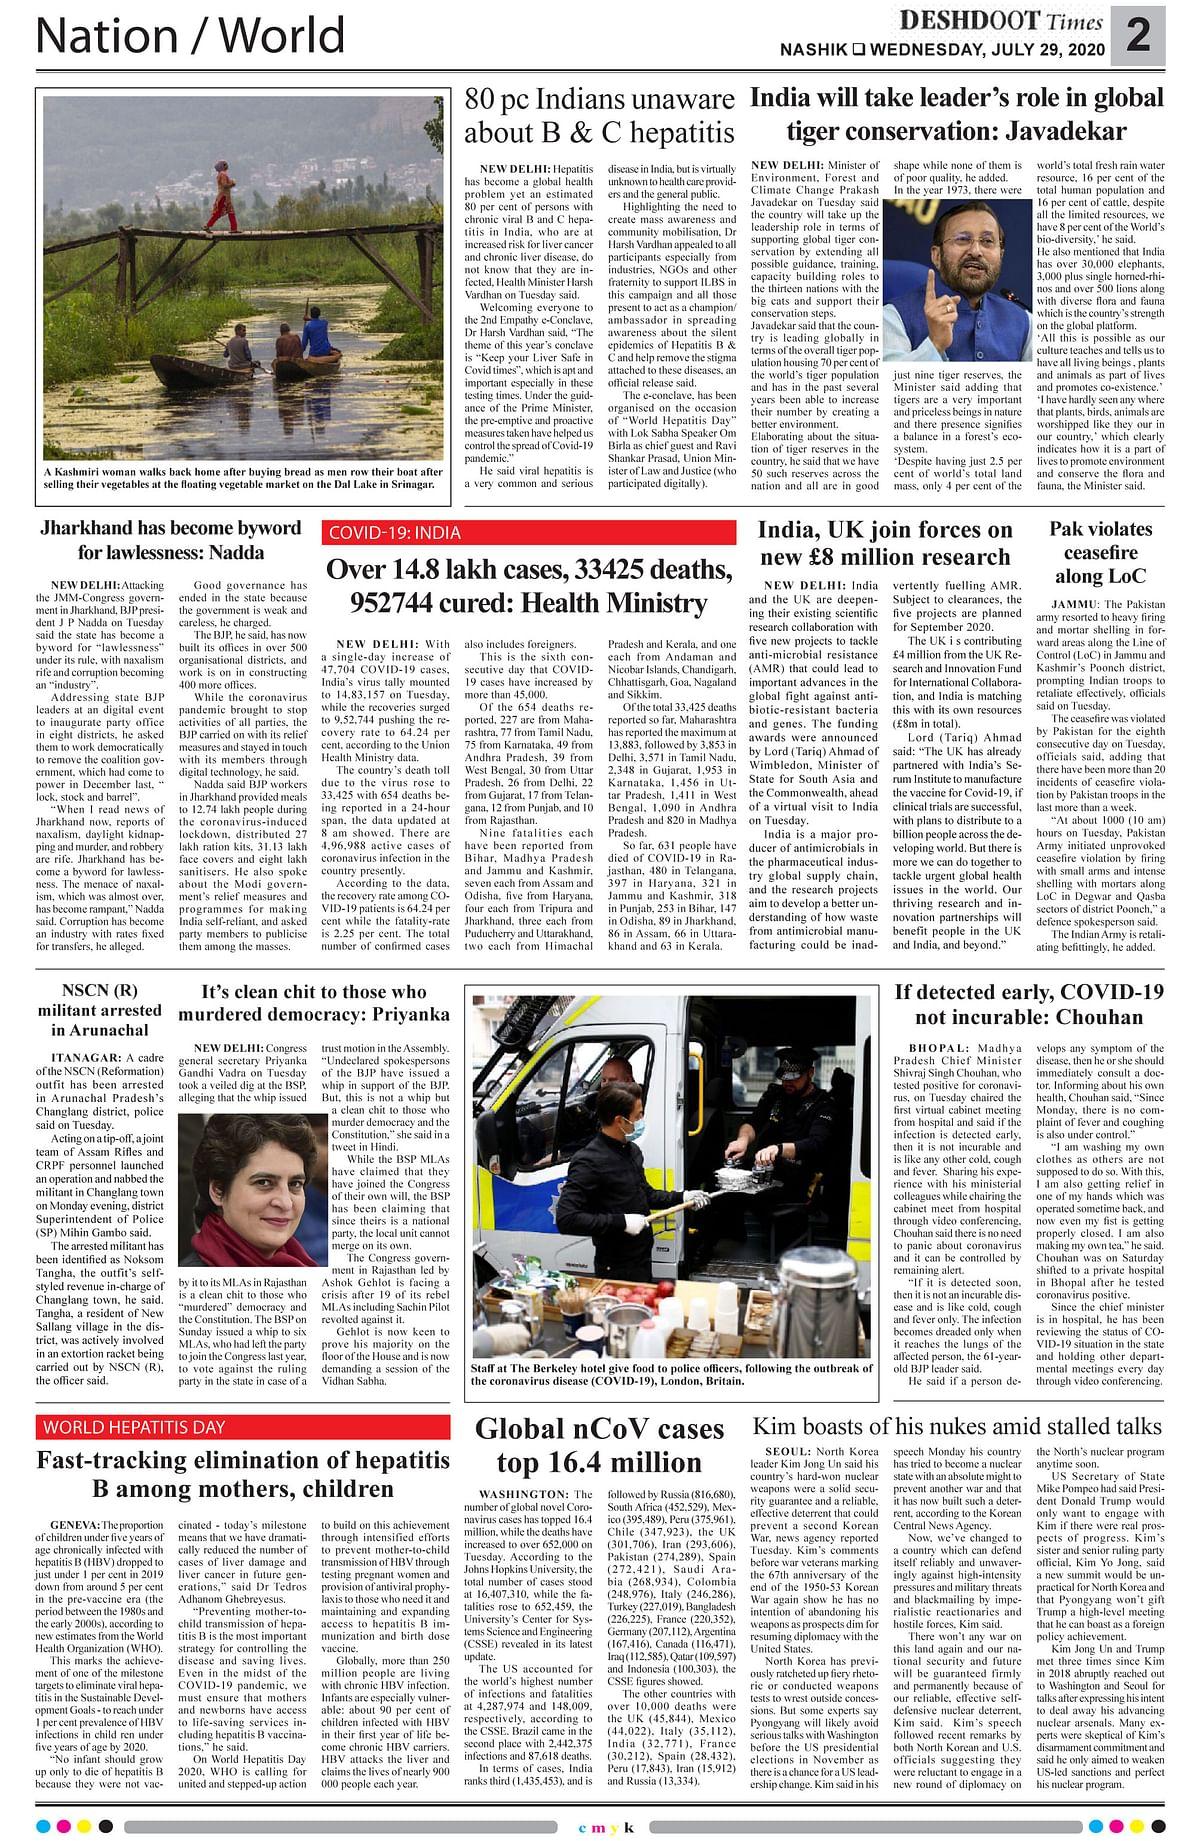 Deshdoot Times E Paper, 29 July 2020